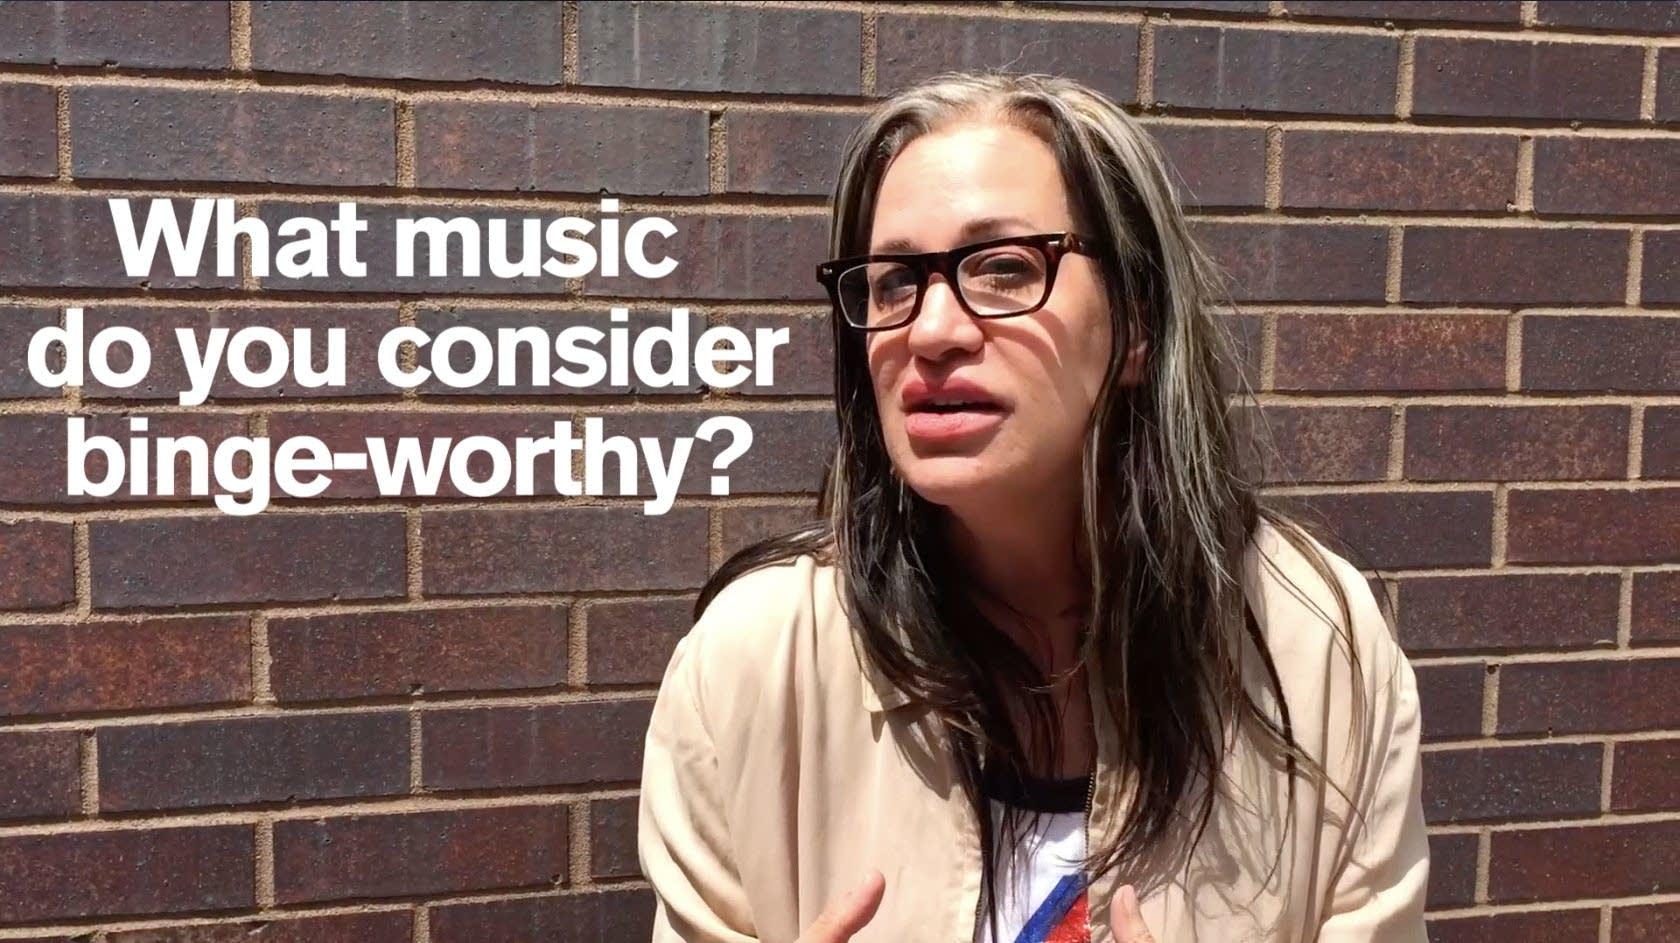 Listen to Looch: Binge-worthy music